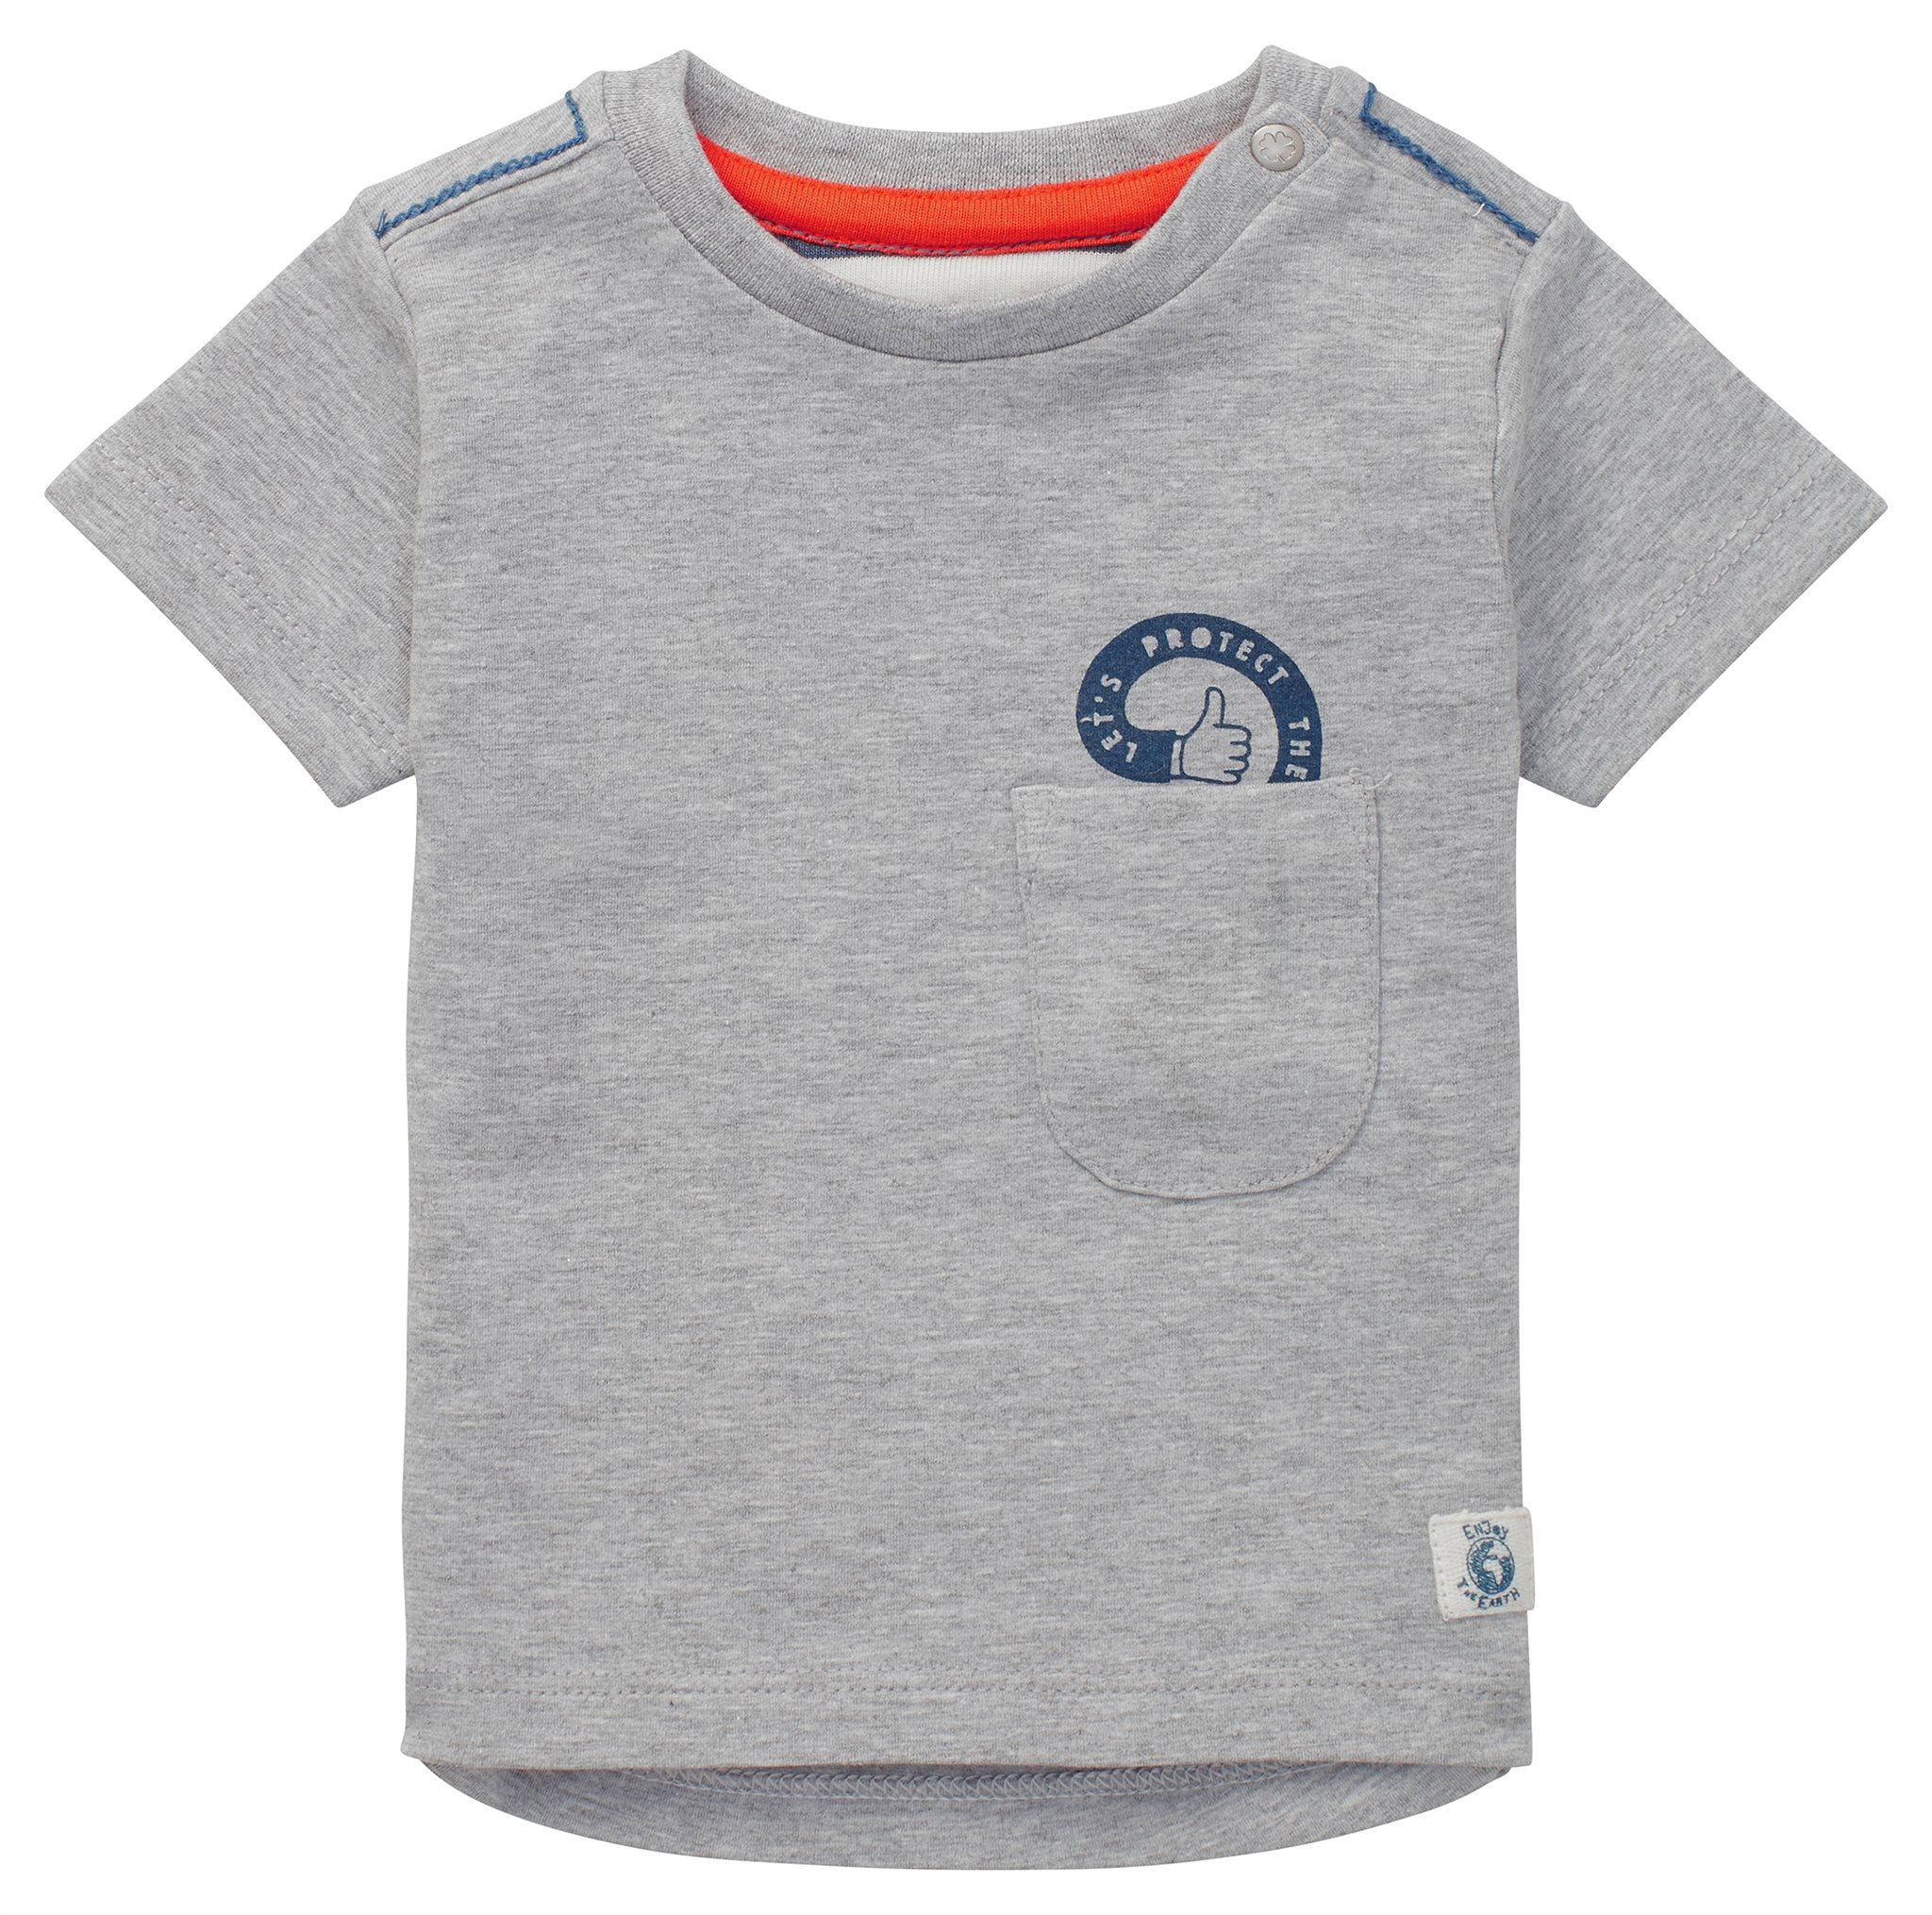 Noppies t-shirt Tijnje